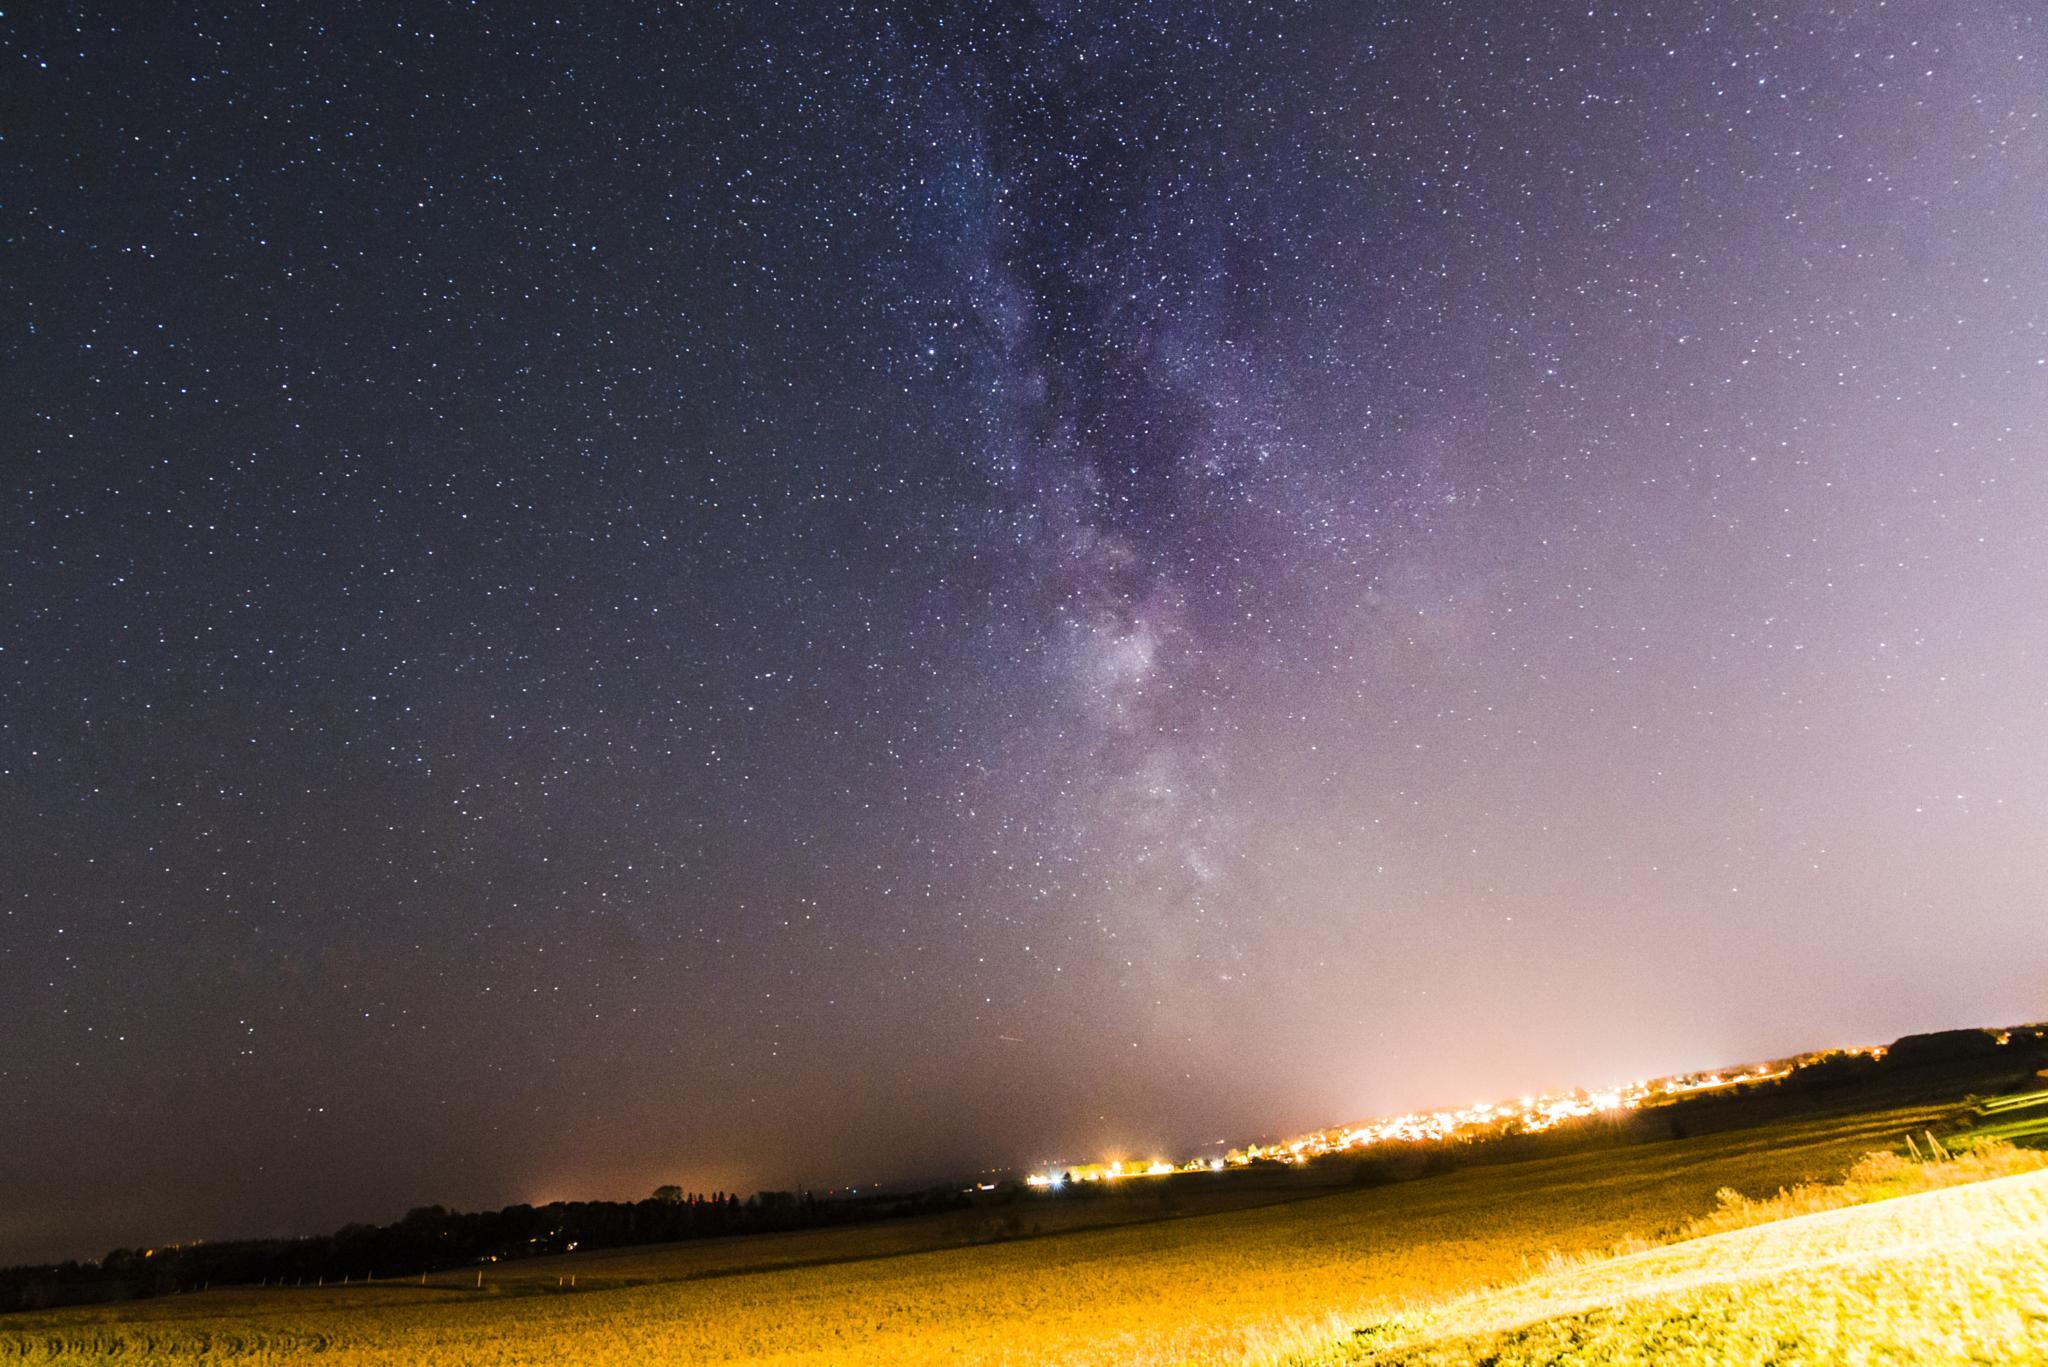 Starlight by Noel Wong